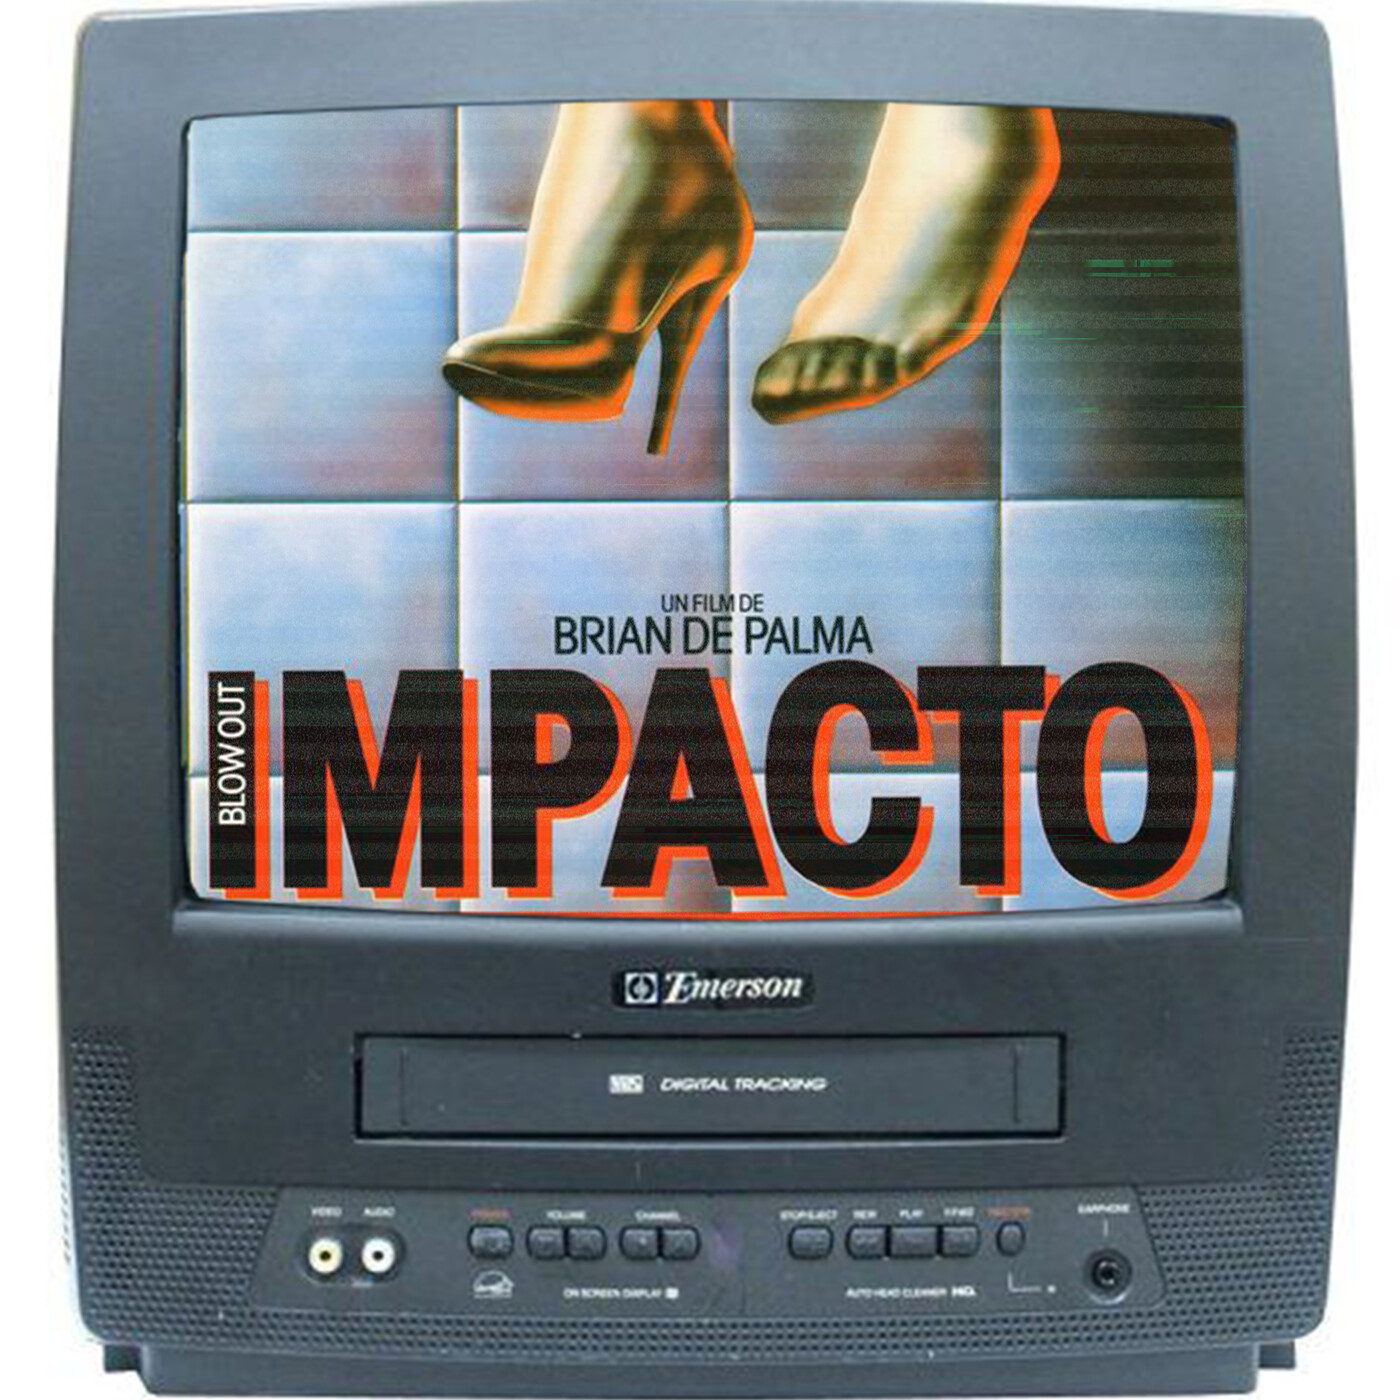 05x17 Remake a los 80, IMPACTO (Blow Out) Brian De Palma, 1981